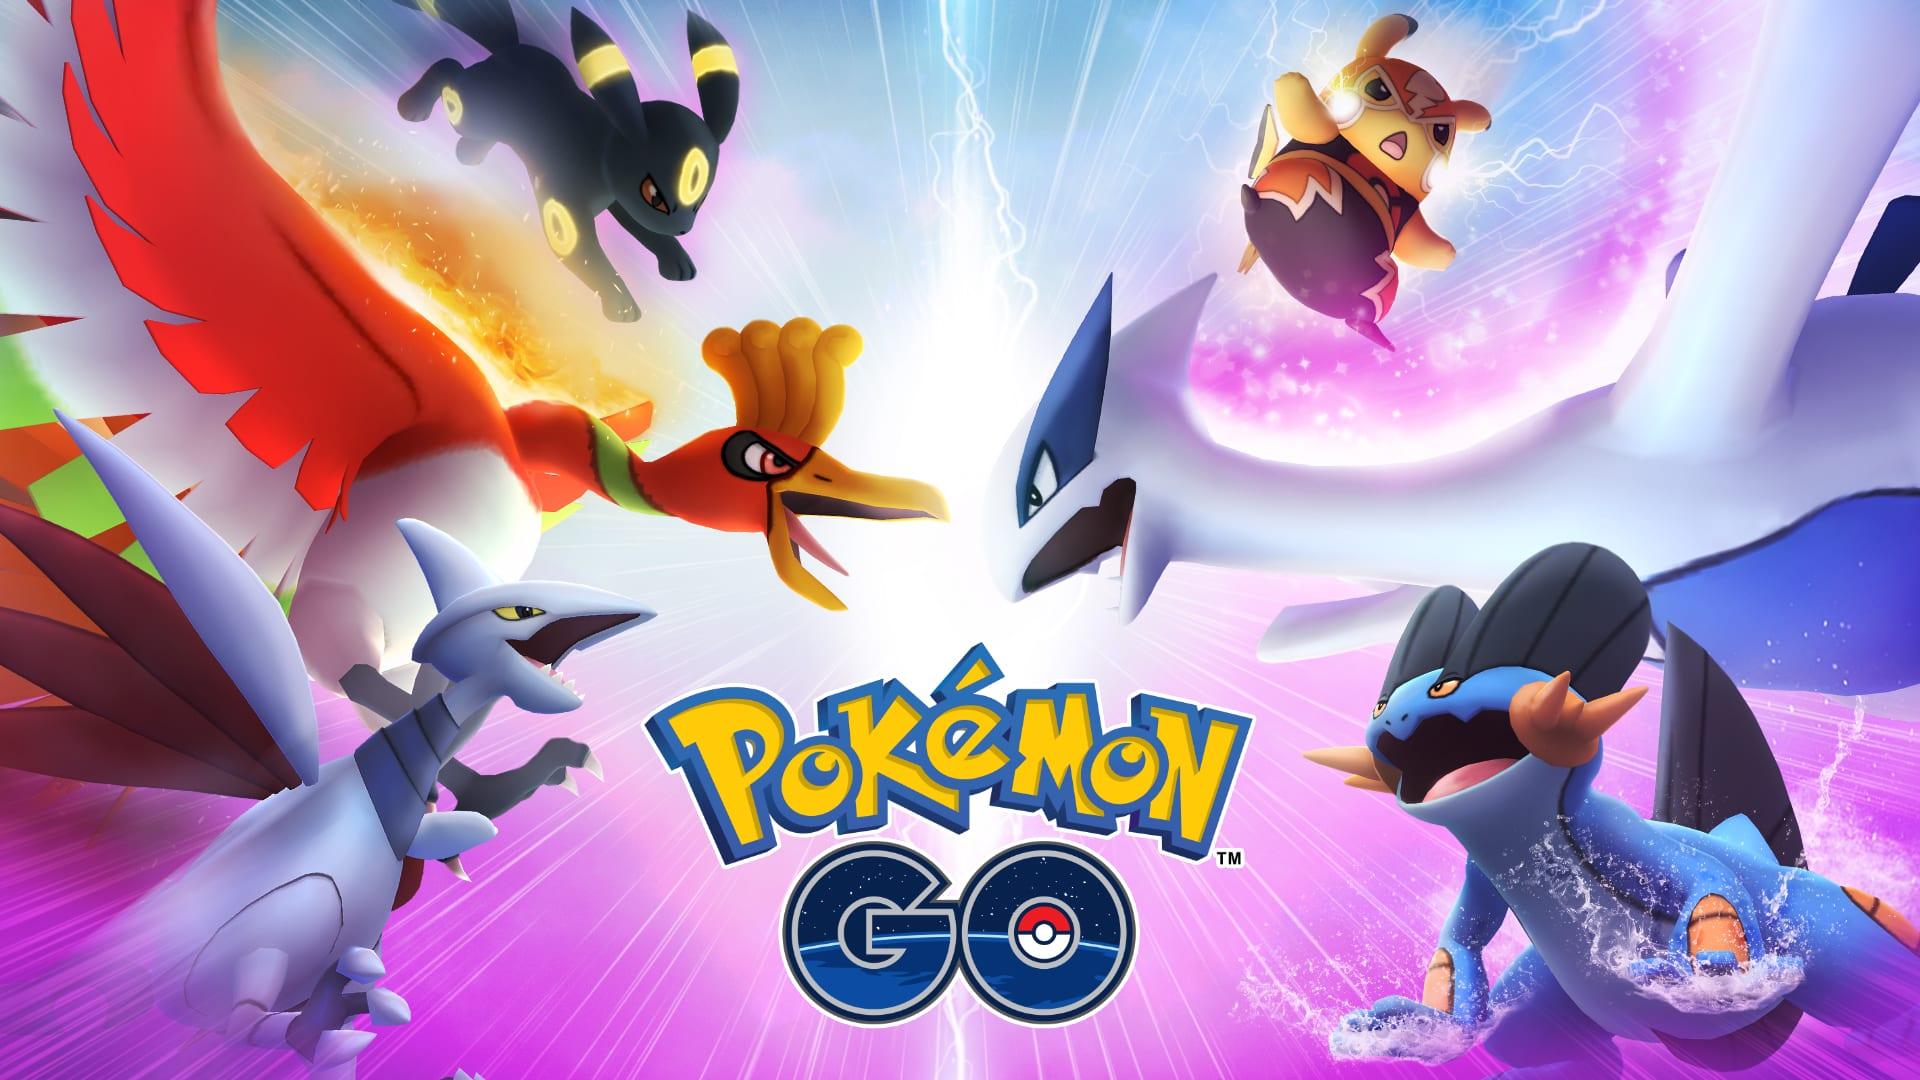 go battle league season one, pokemon go battle league season one